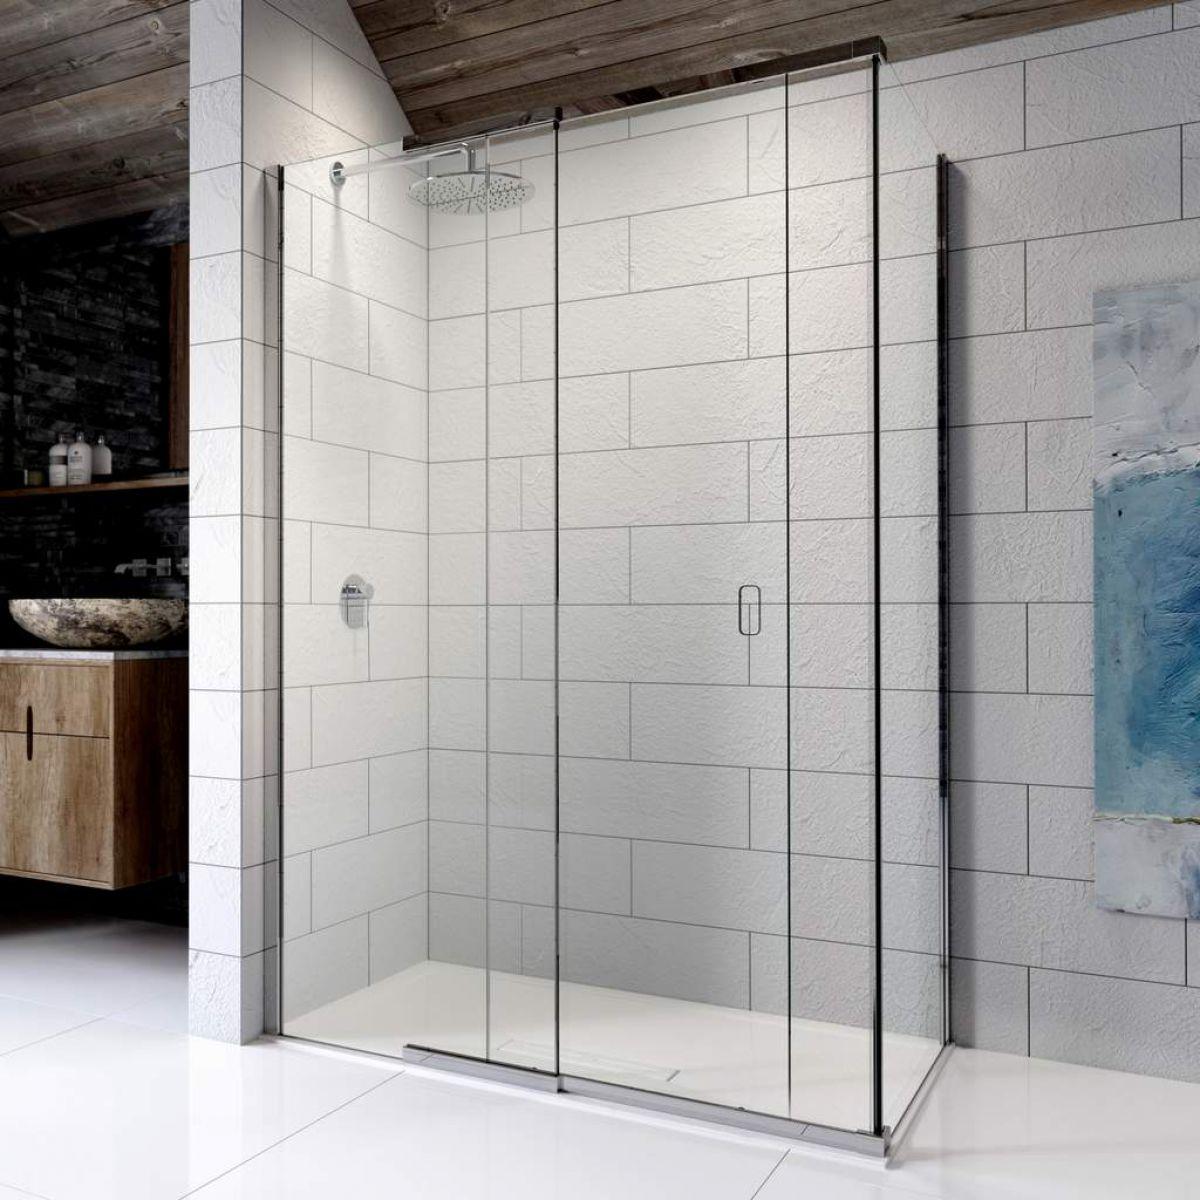 Sliding Bathroom Entry Doors: Kudos Pinnacle 8 Sliding Shower Door For Corner : UK Bathrooms